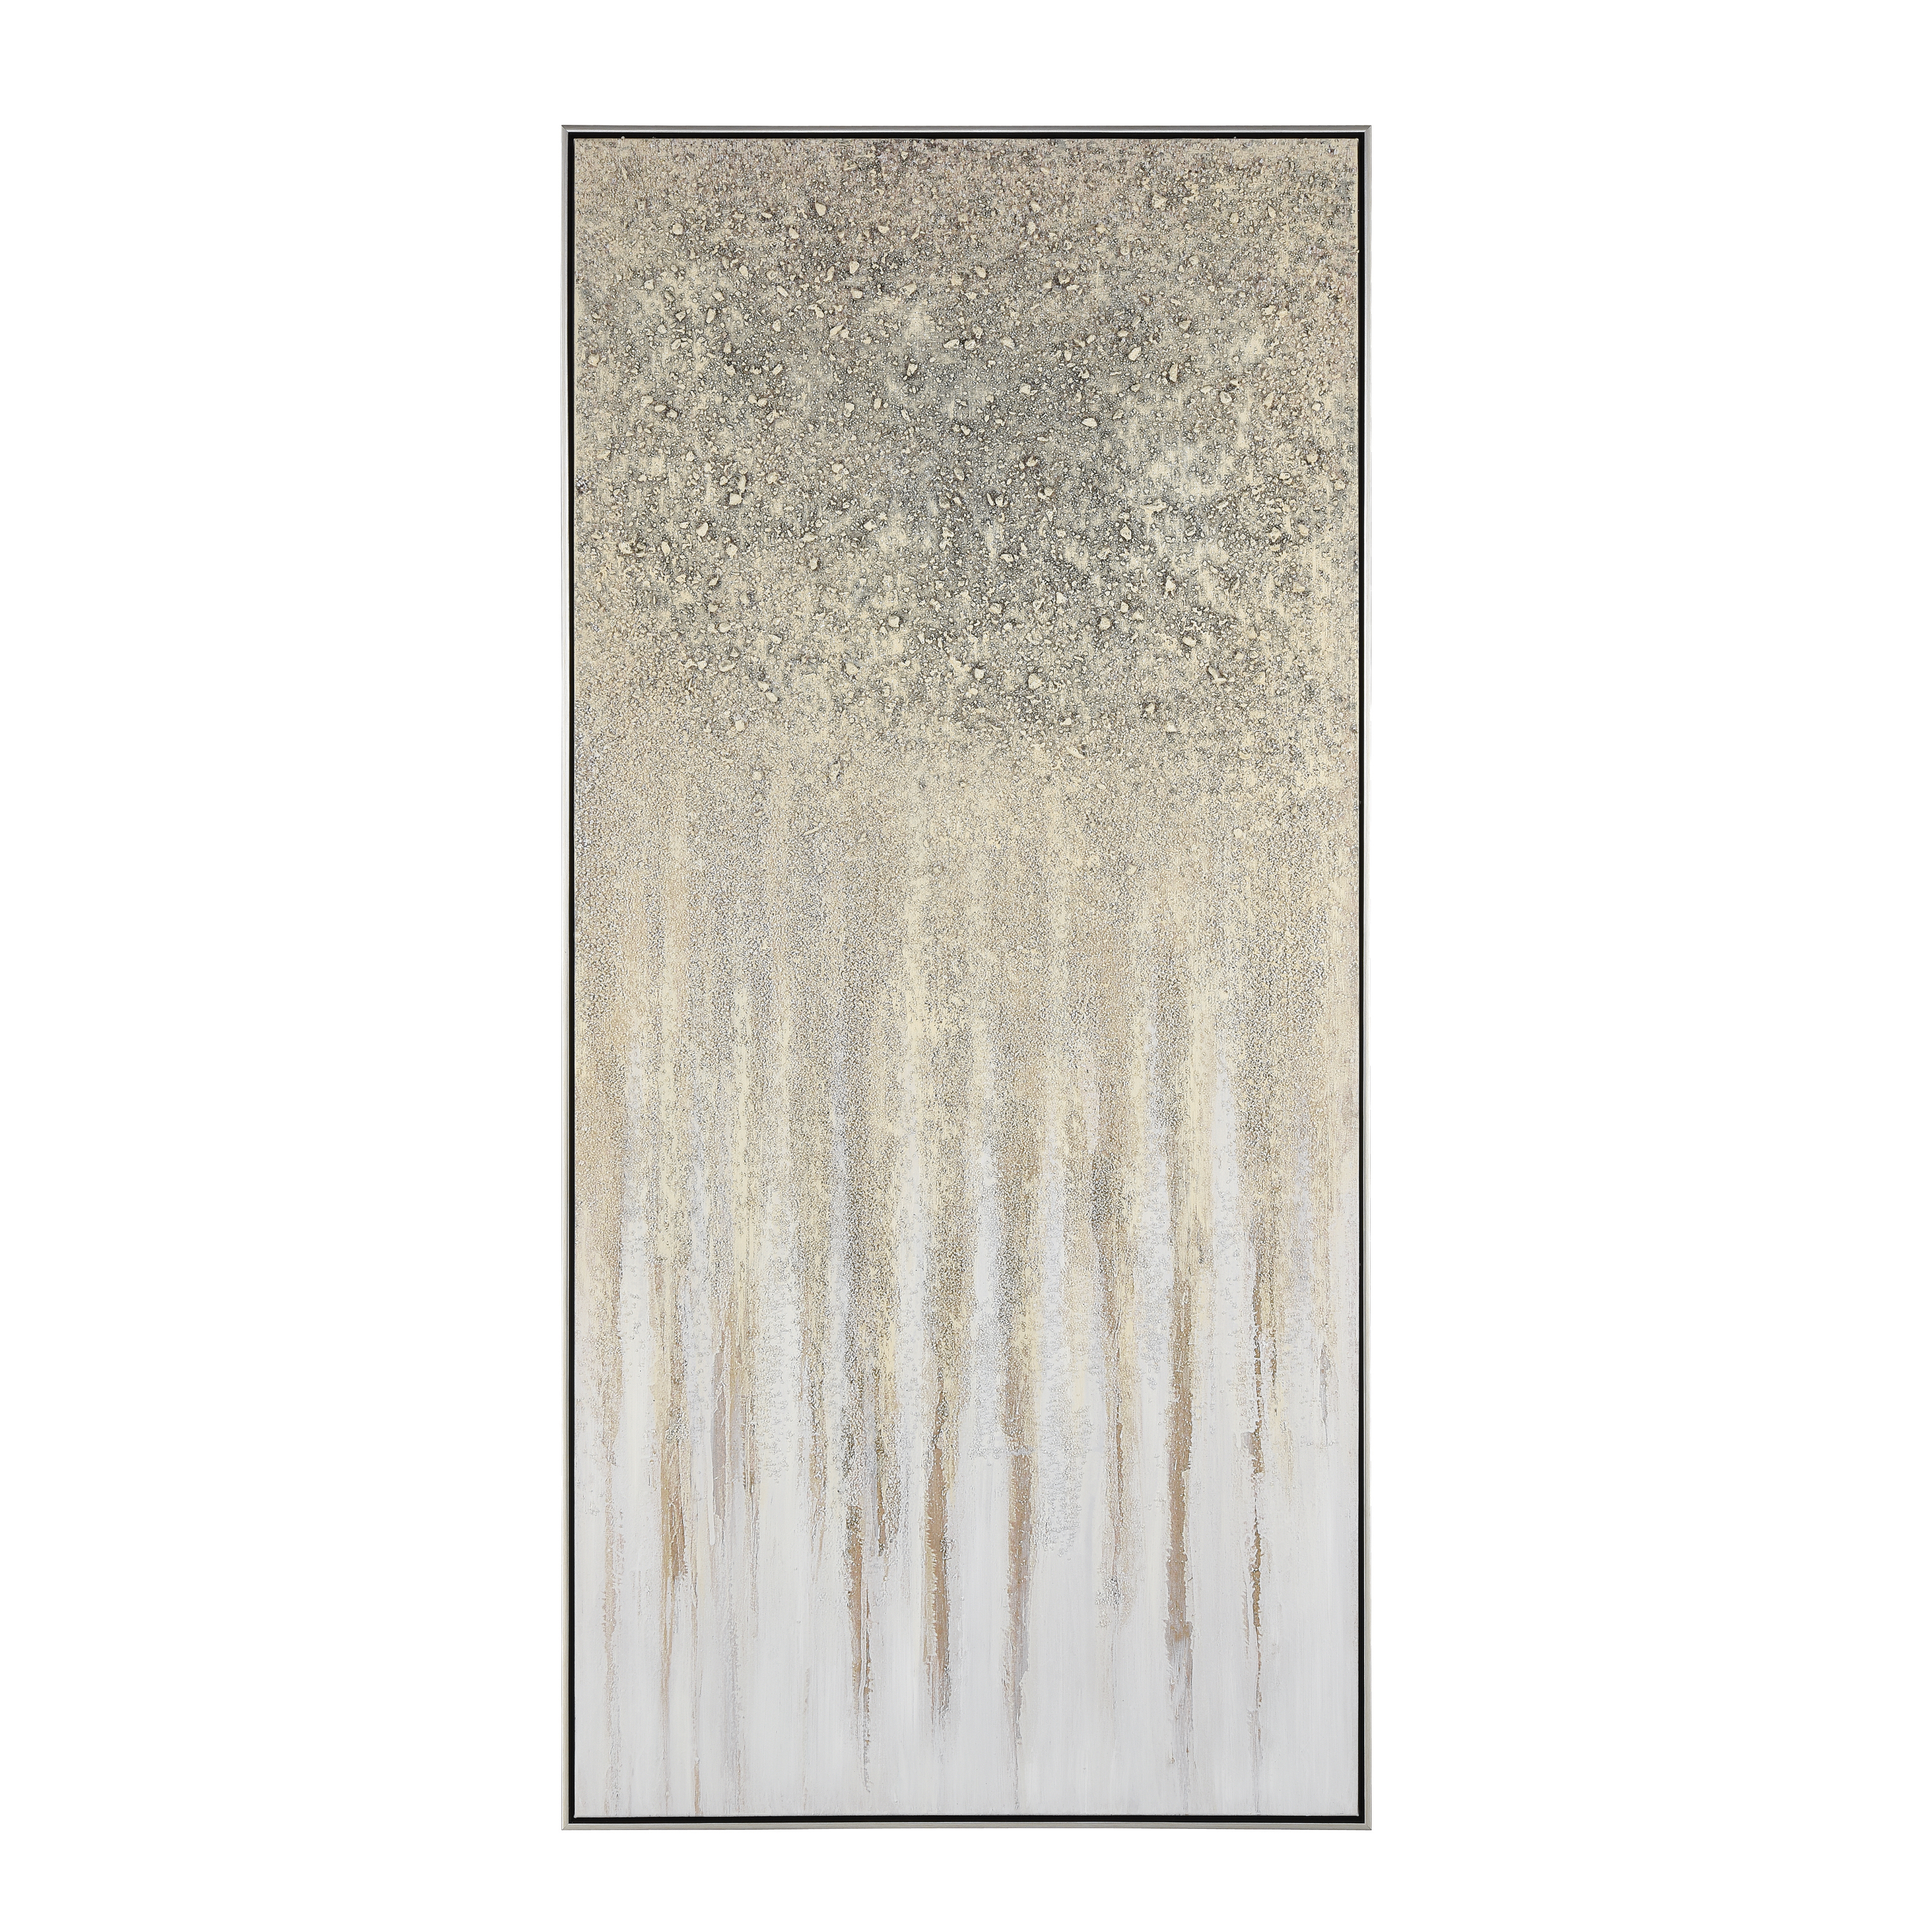 Vesper Wall Decor in Gold and White | Elk Home